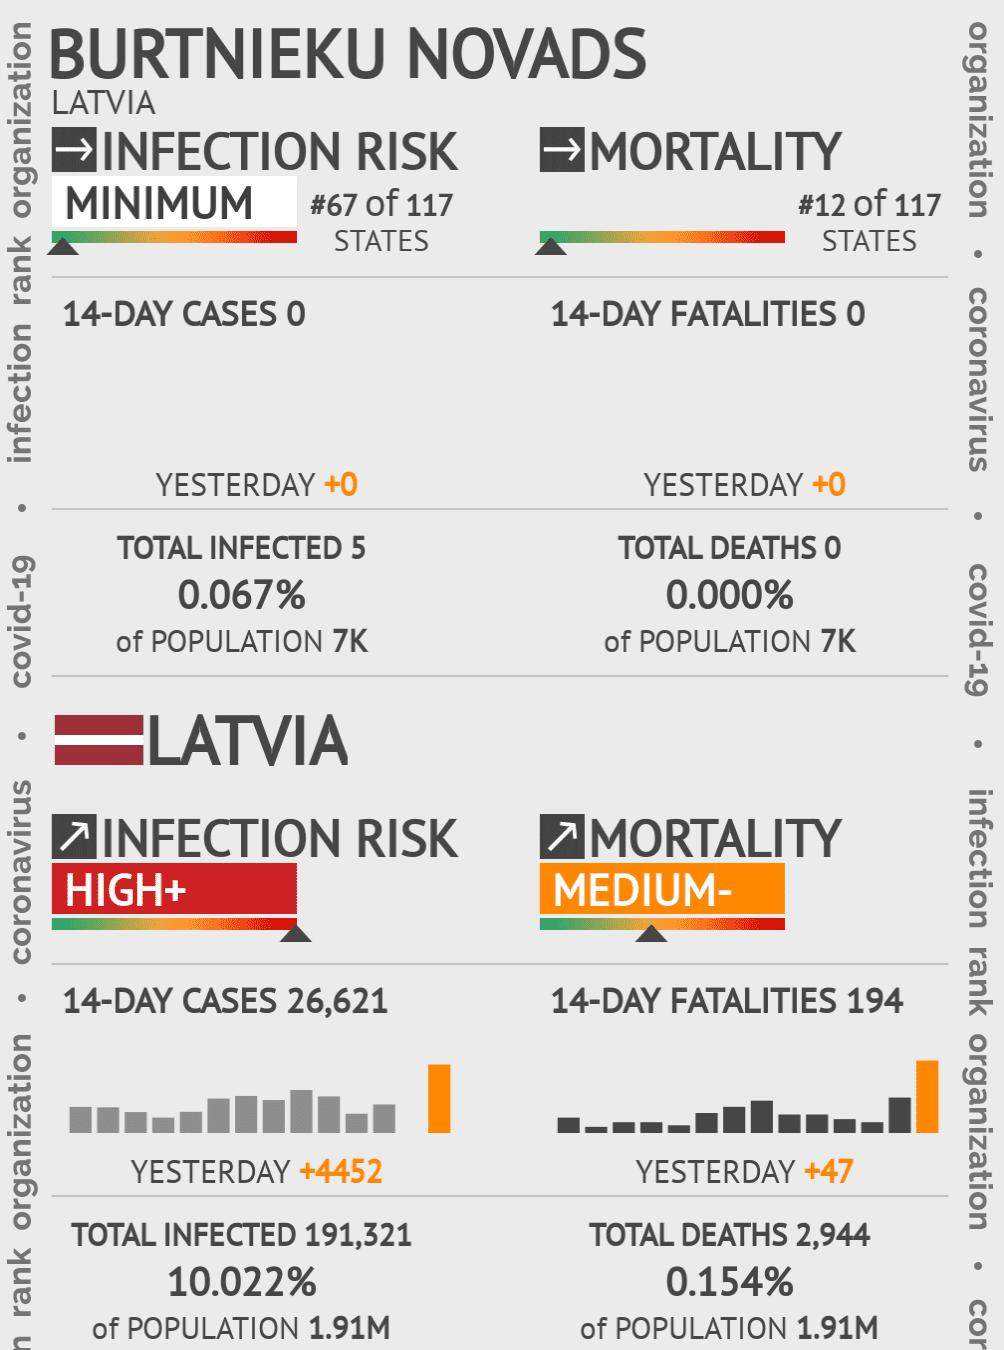 Burtnieku novads Coronavirus Covid-19 Risk of Infection on May 14, 2020